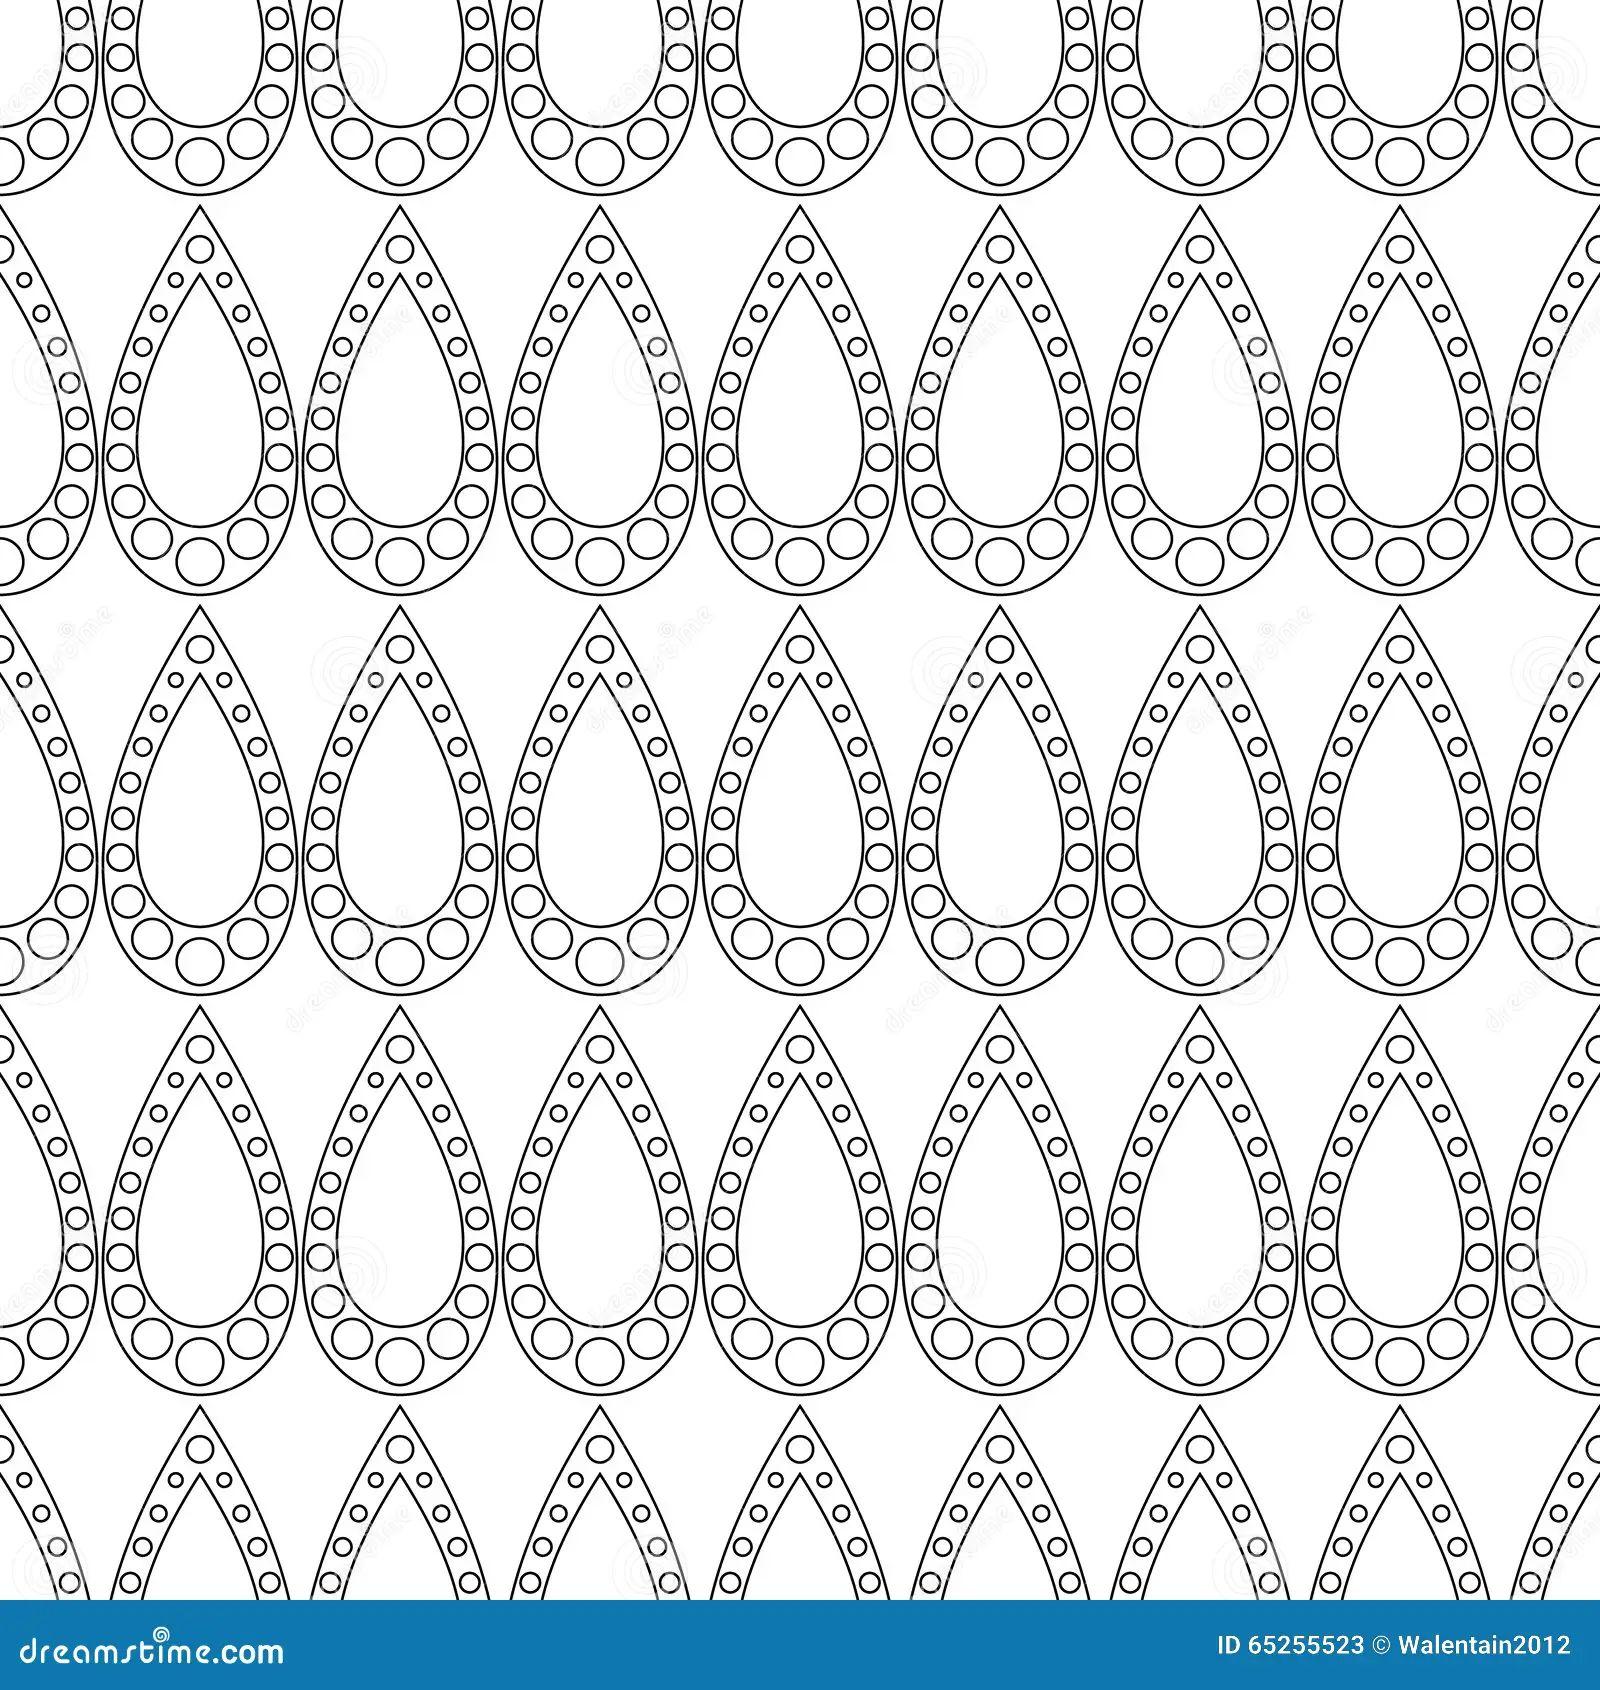 abstract concept vector monochrome geometric pattern auto